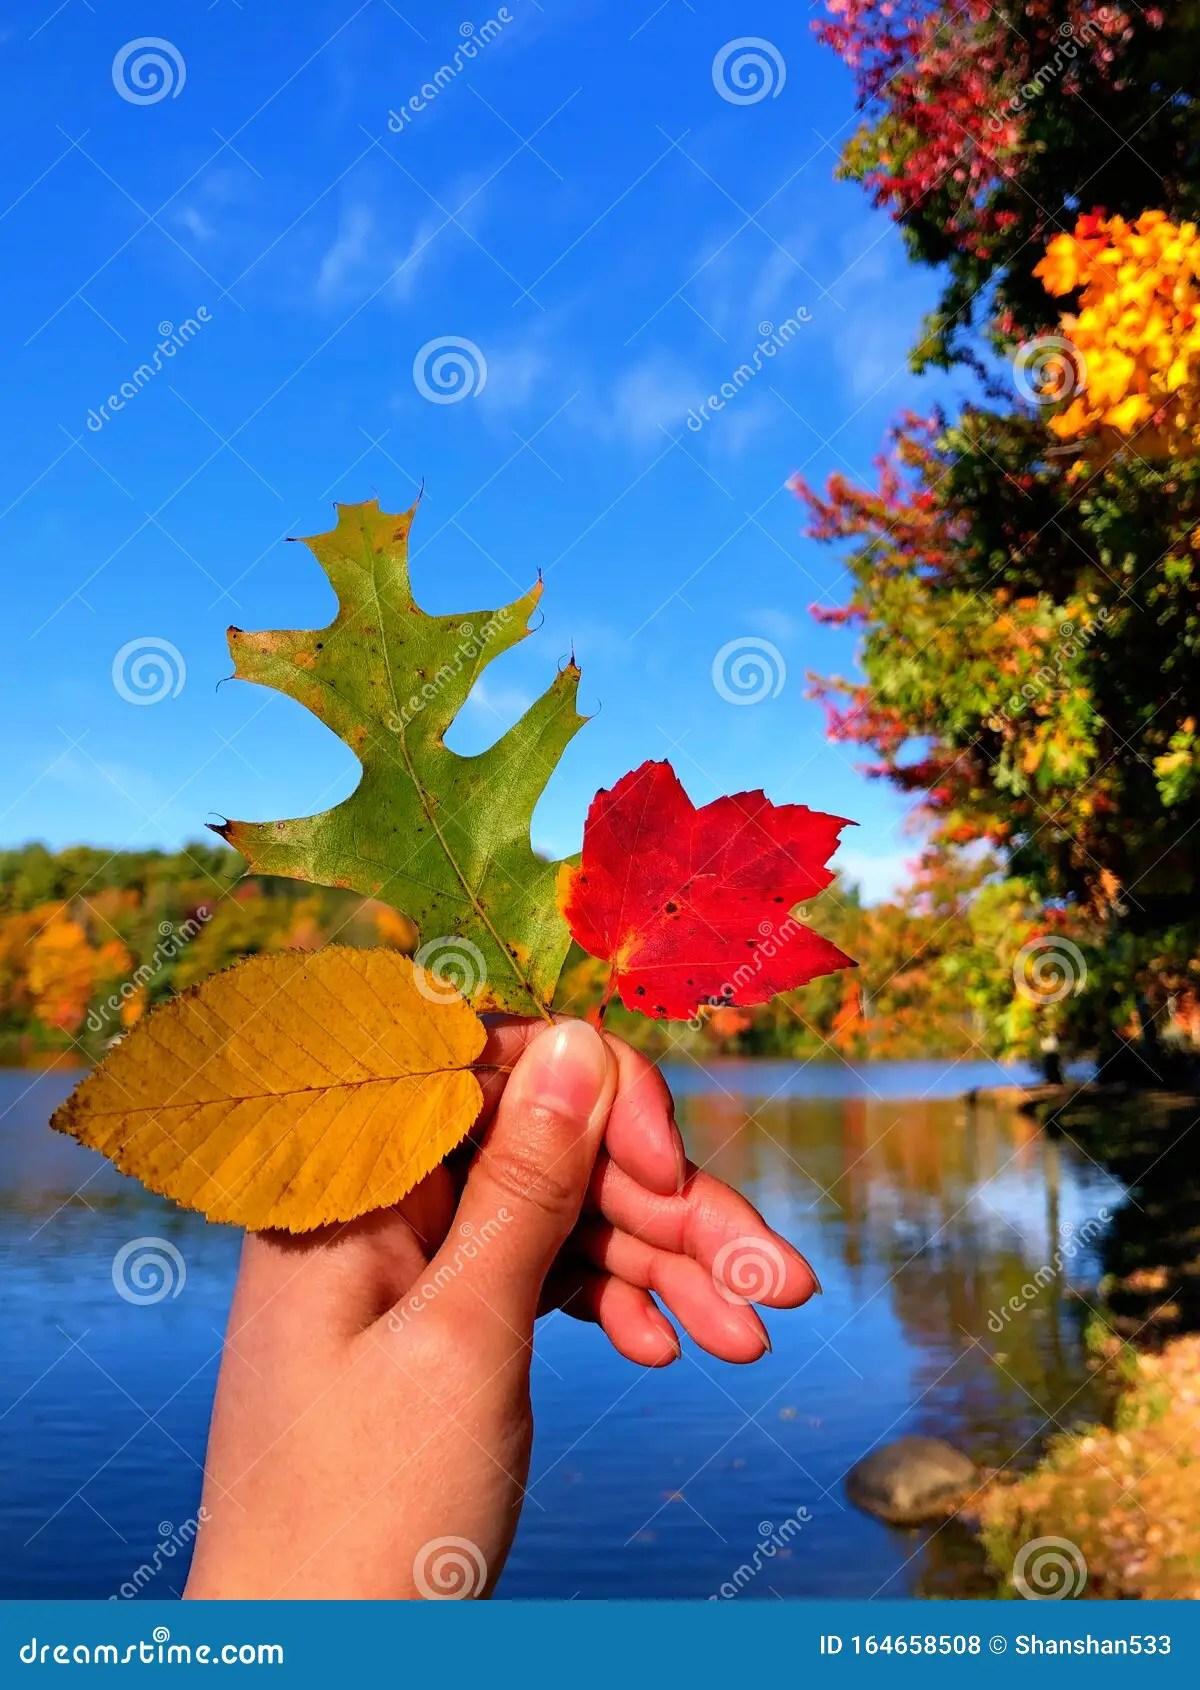 Red Maple Tree Leaf Yellow Elm Leaf And A Green Oak Leaf